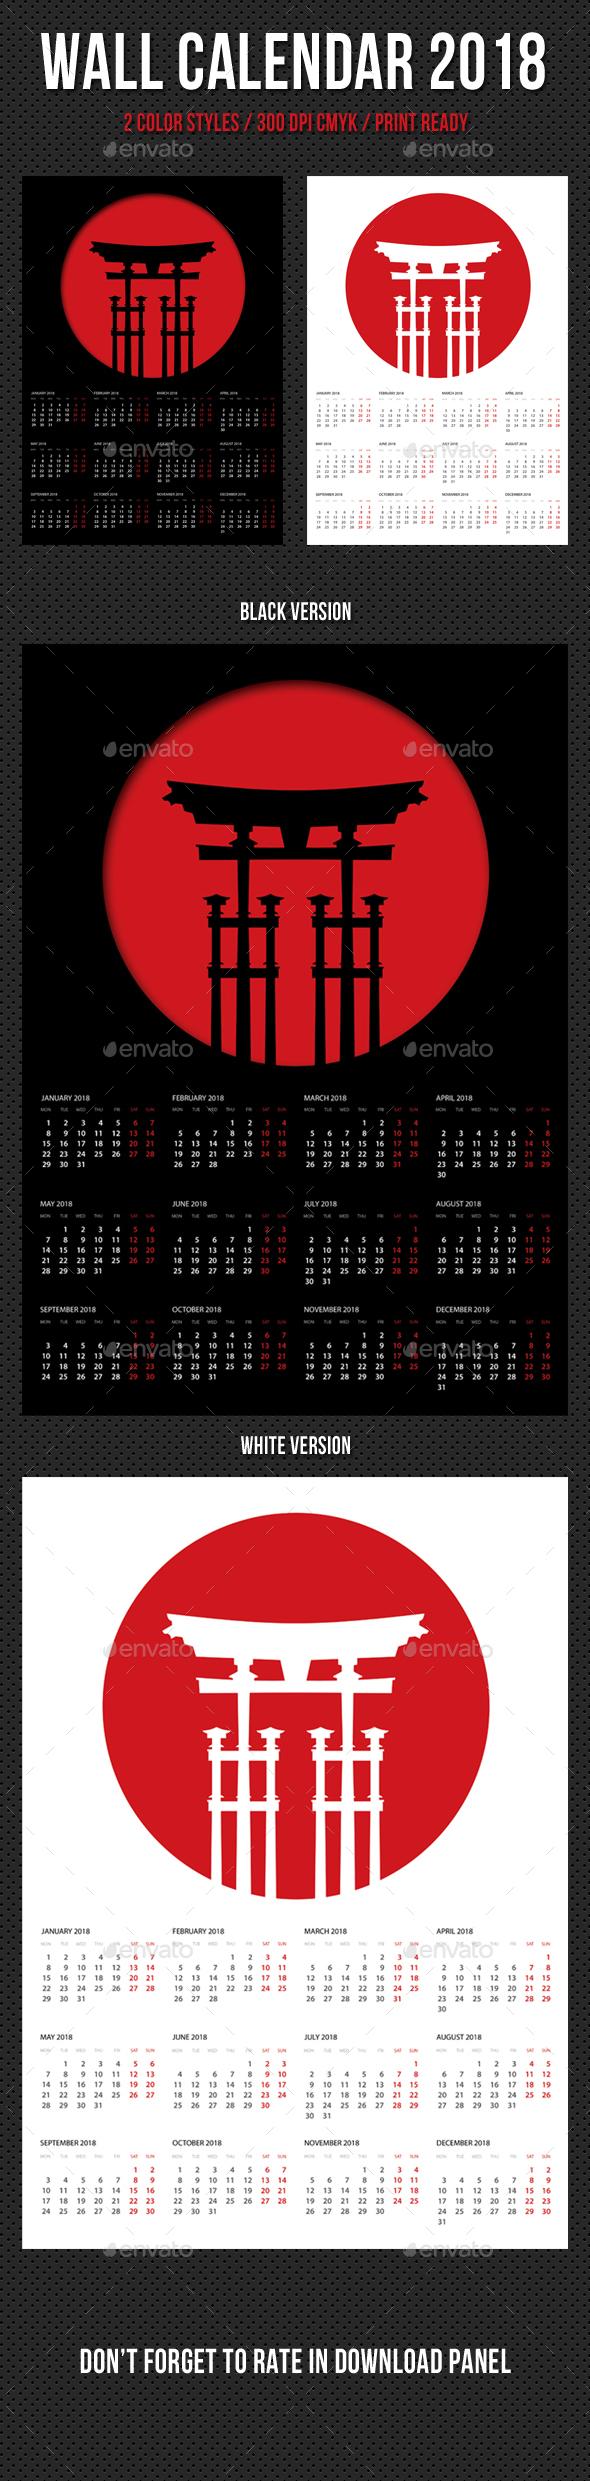 Wall Calendar A3 2018 V11 - Calendars Stationery